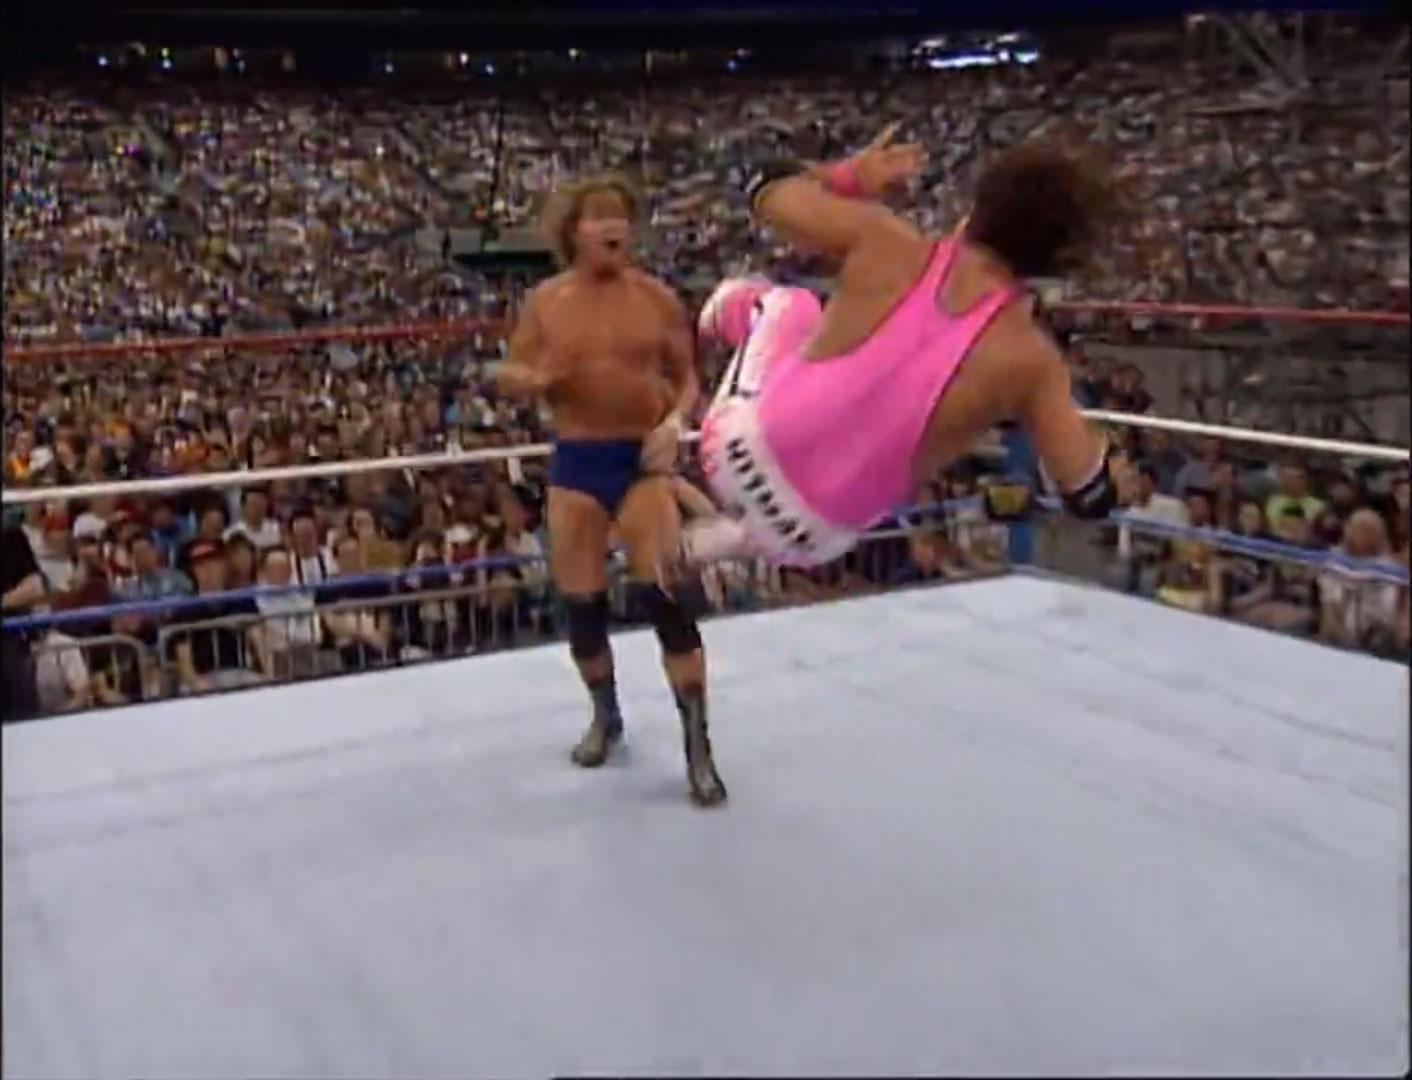 Bret Hart vs. Roddy Piper WWF Intercontinental Championship WWF WrestleMania VIII, Apr 5th 1992